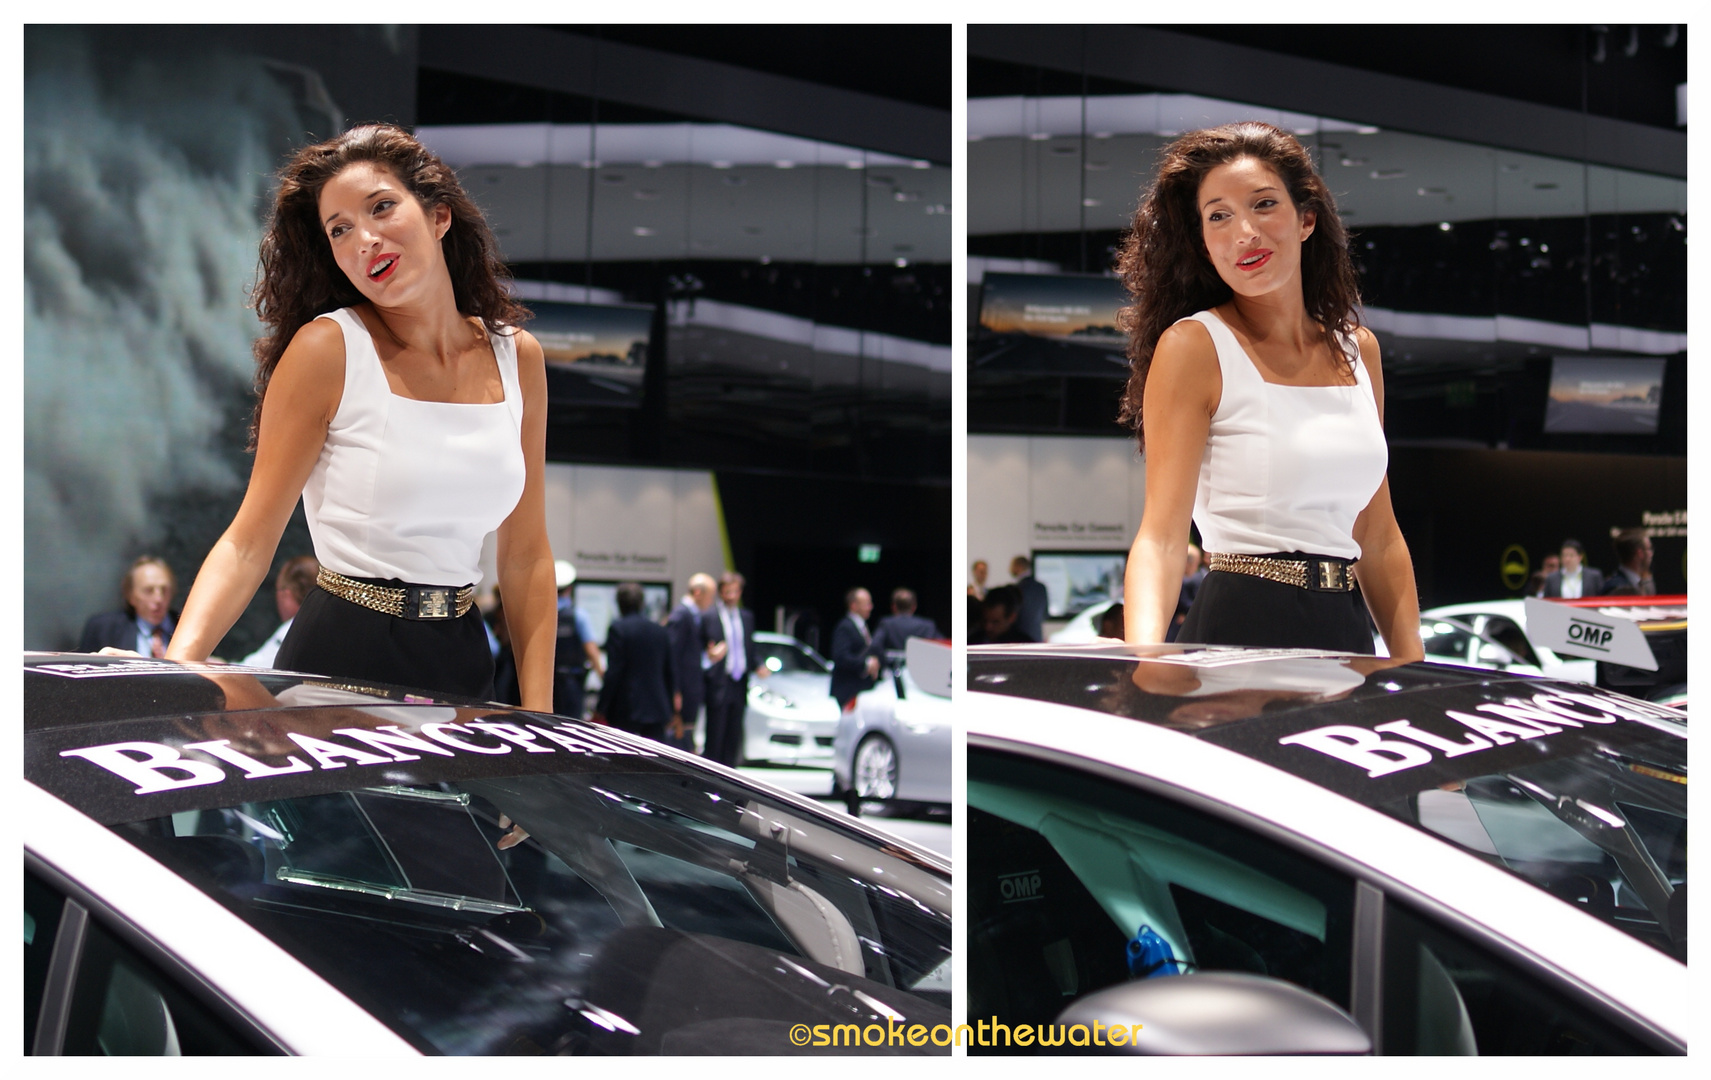 bella macchina, bella donna